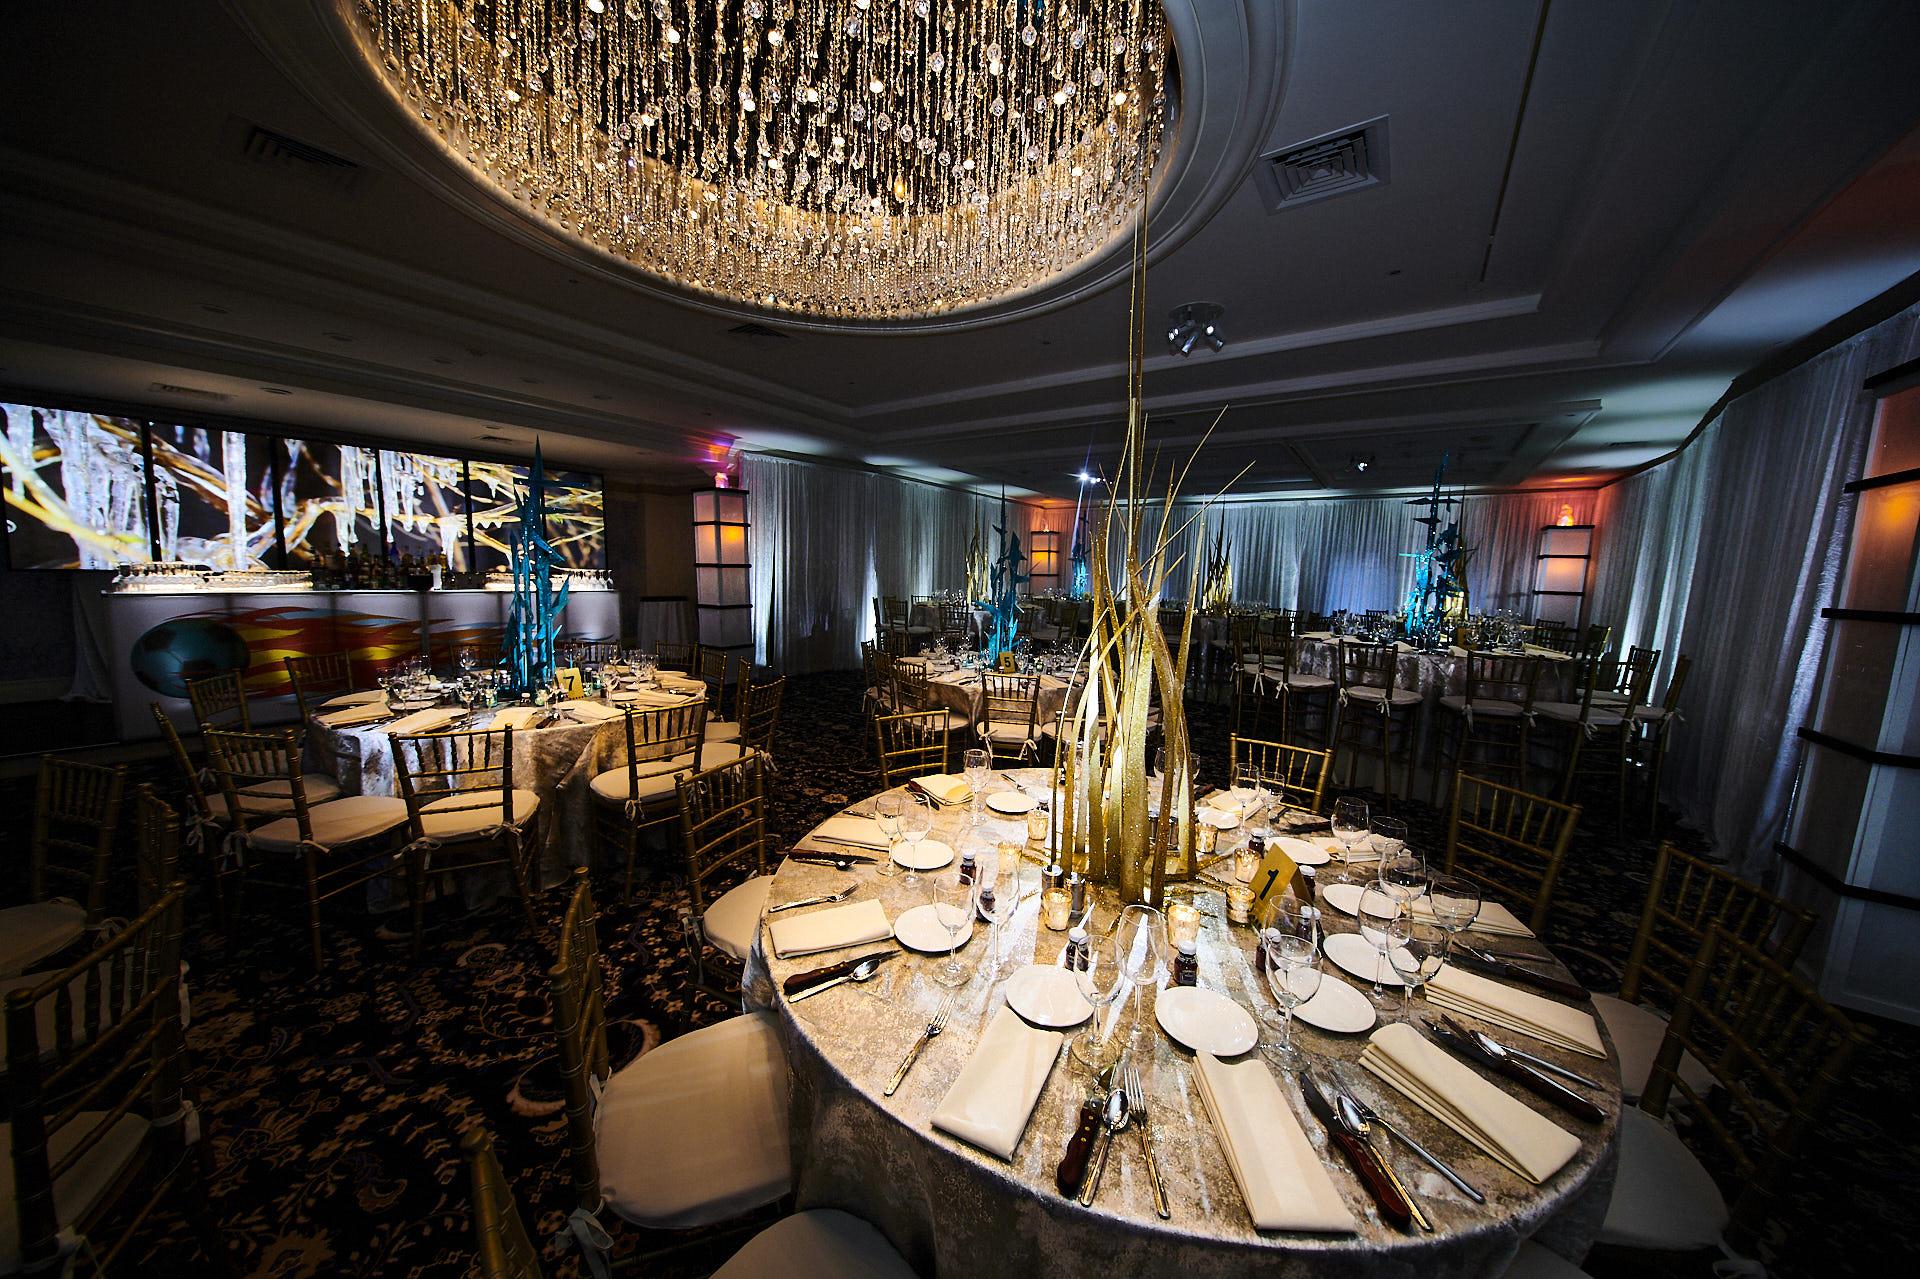 event+decor+design+nj+mitzvah+ny+ct+party+rentals+centerpieces+fire+ice+rental.jpg